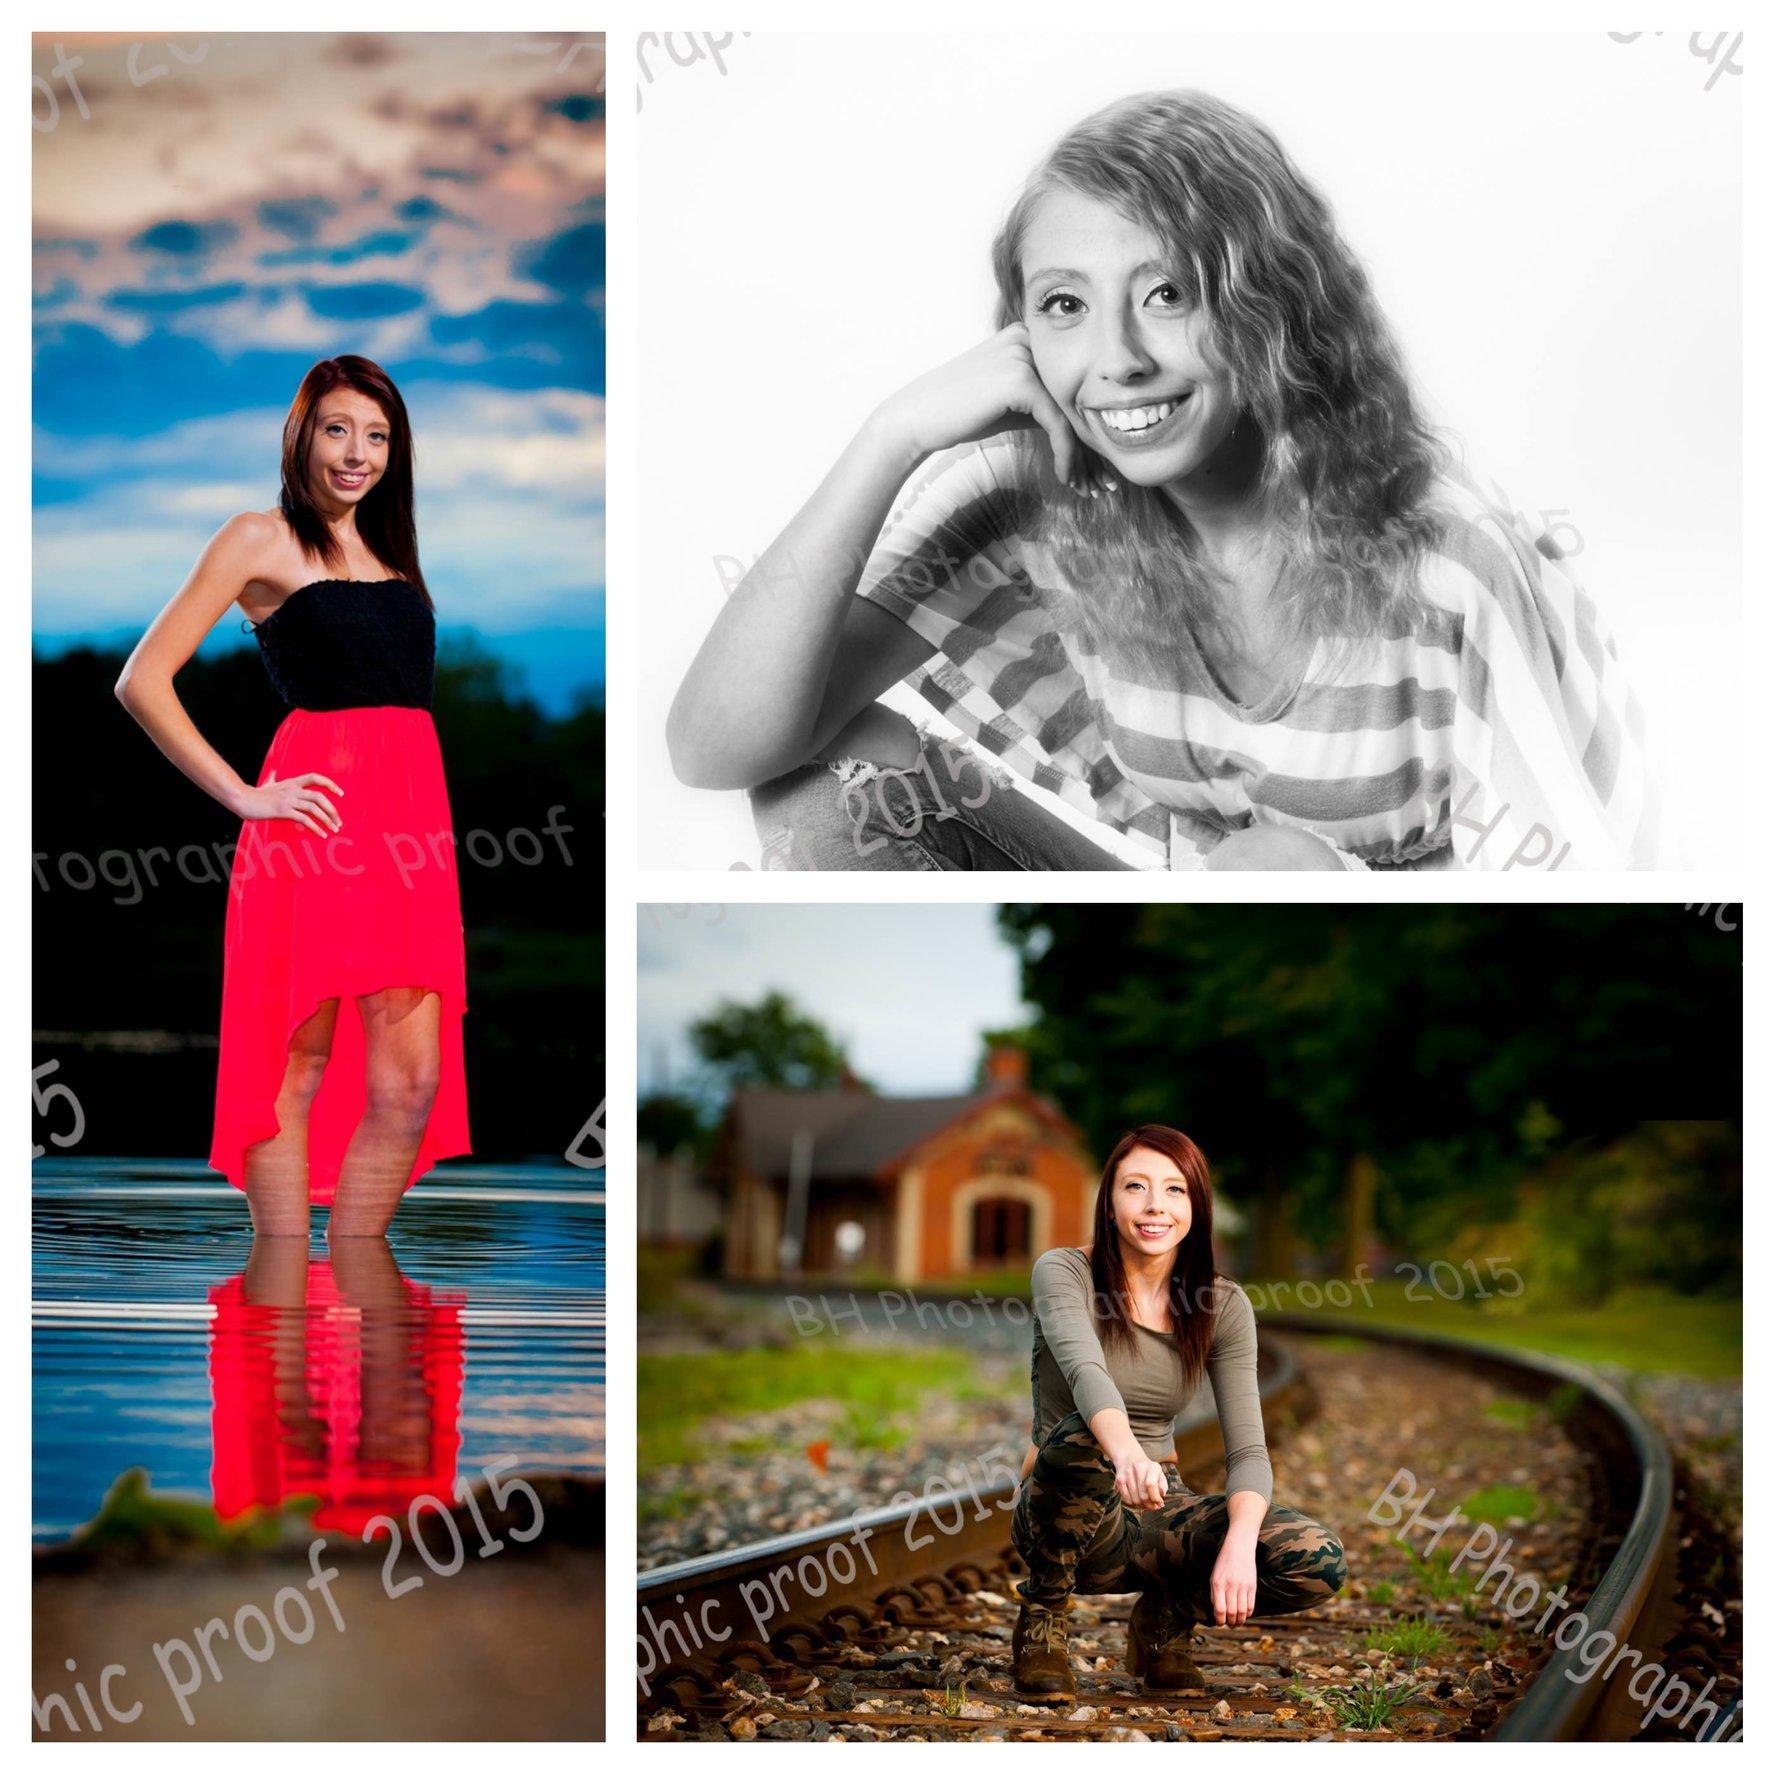 BH3_5133_Fotor_Collage MORGAN 3.jpg